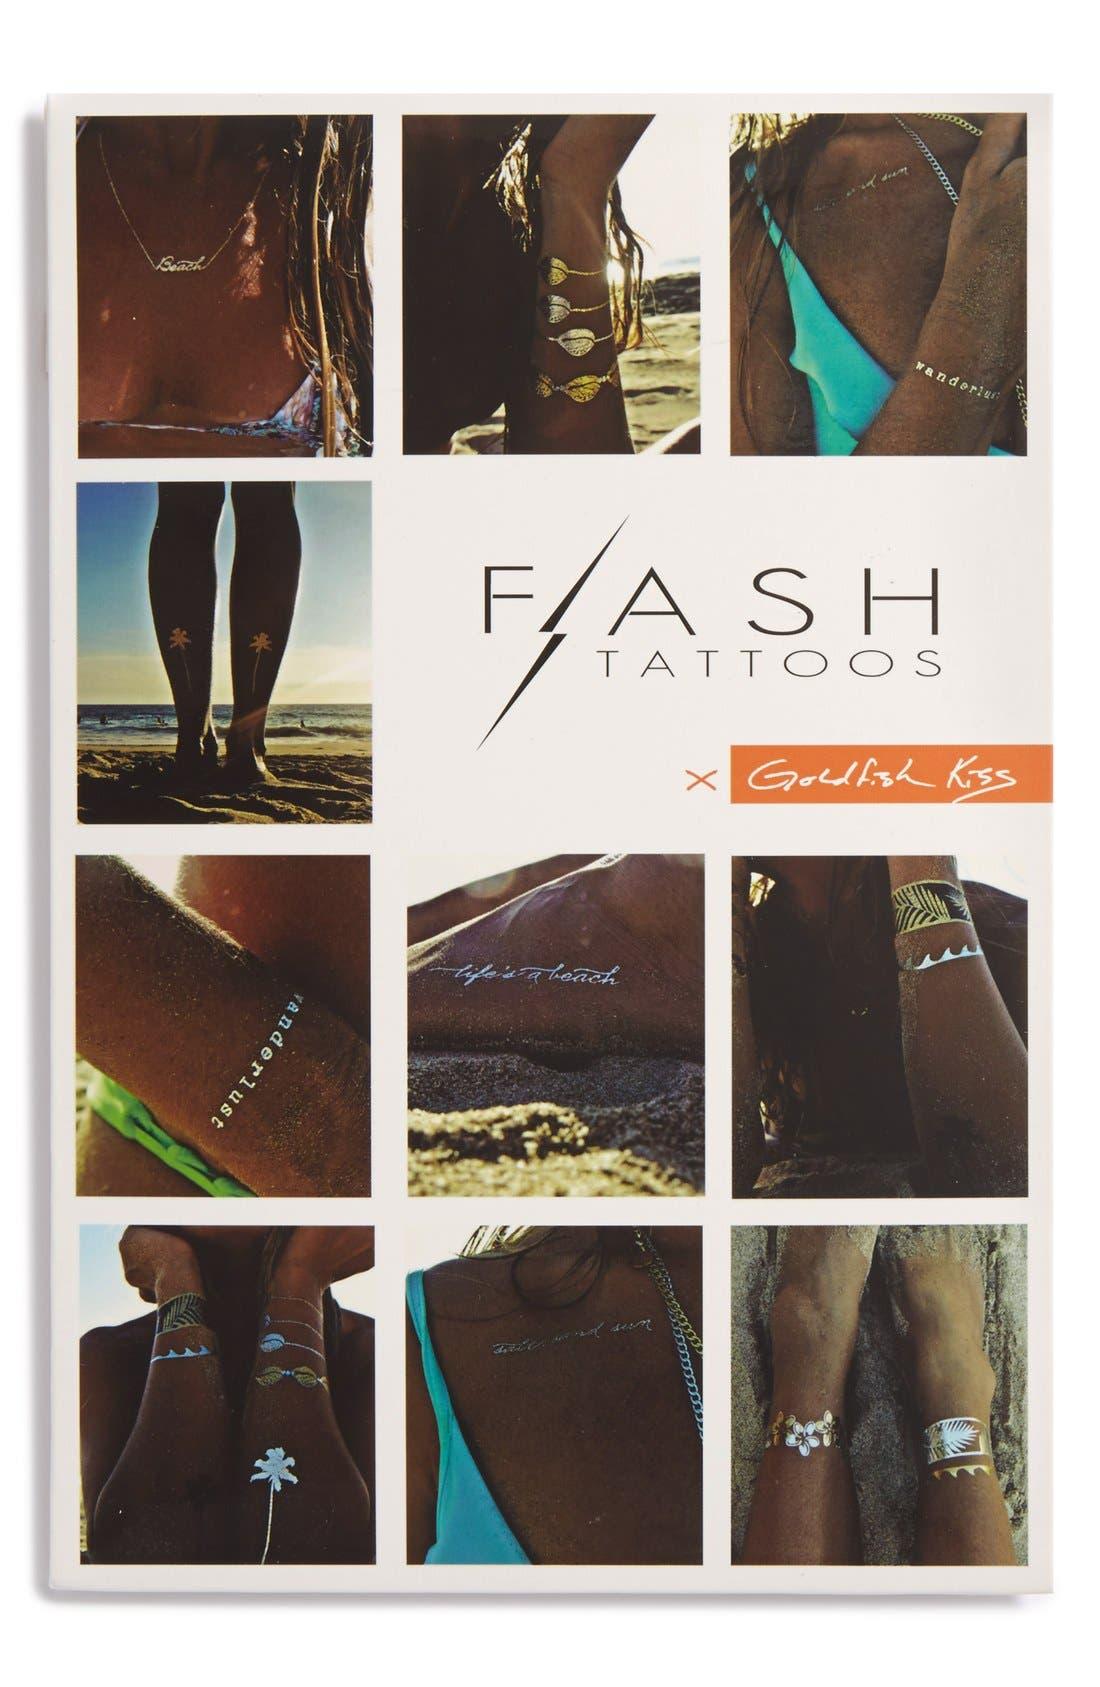 Alternate Image 1 Selected - Flash Tattoos 'Goldfish Kiss' Temporary Tattoos (Juniors)